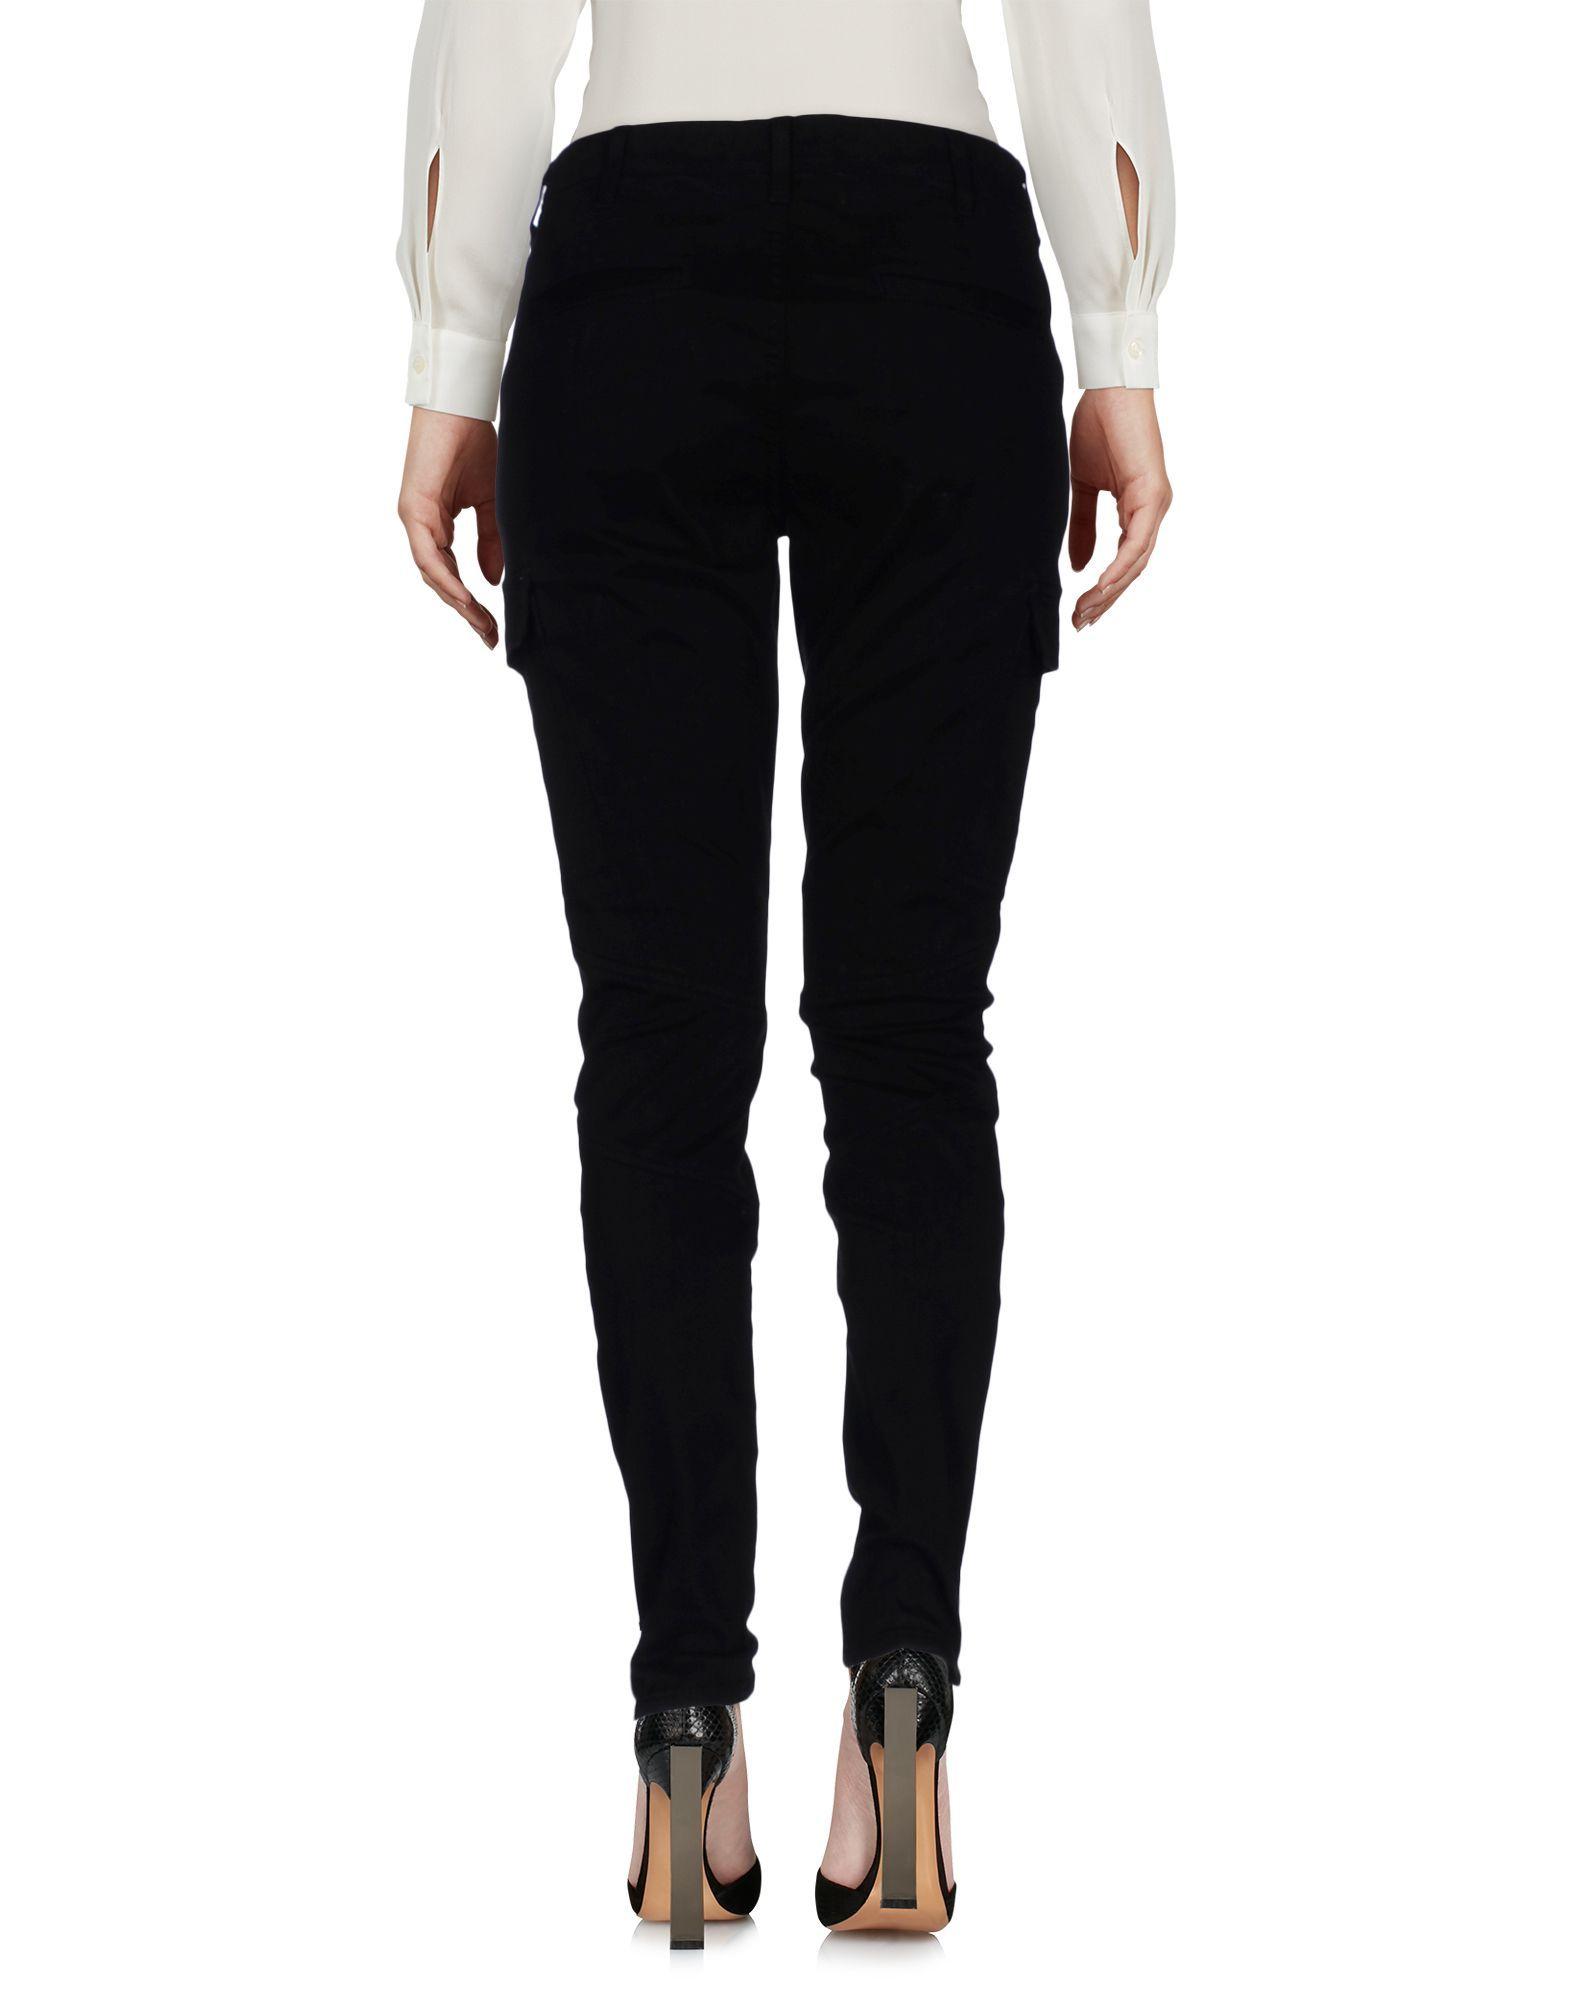 J Brand Black Cotton Tapered Leg Trousers